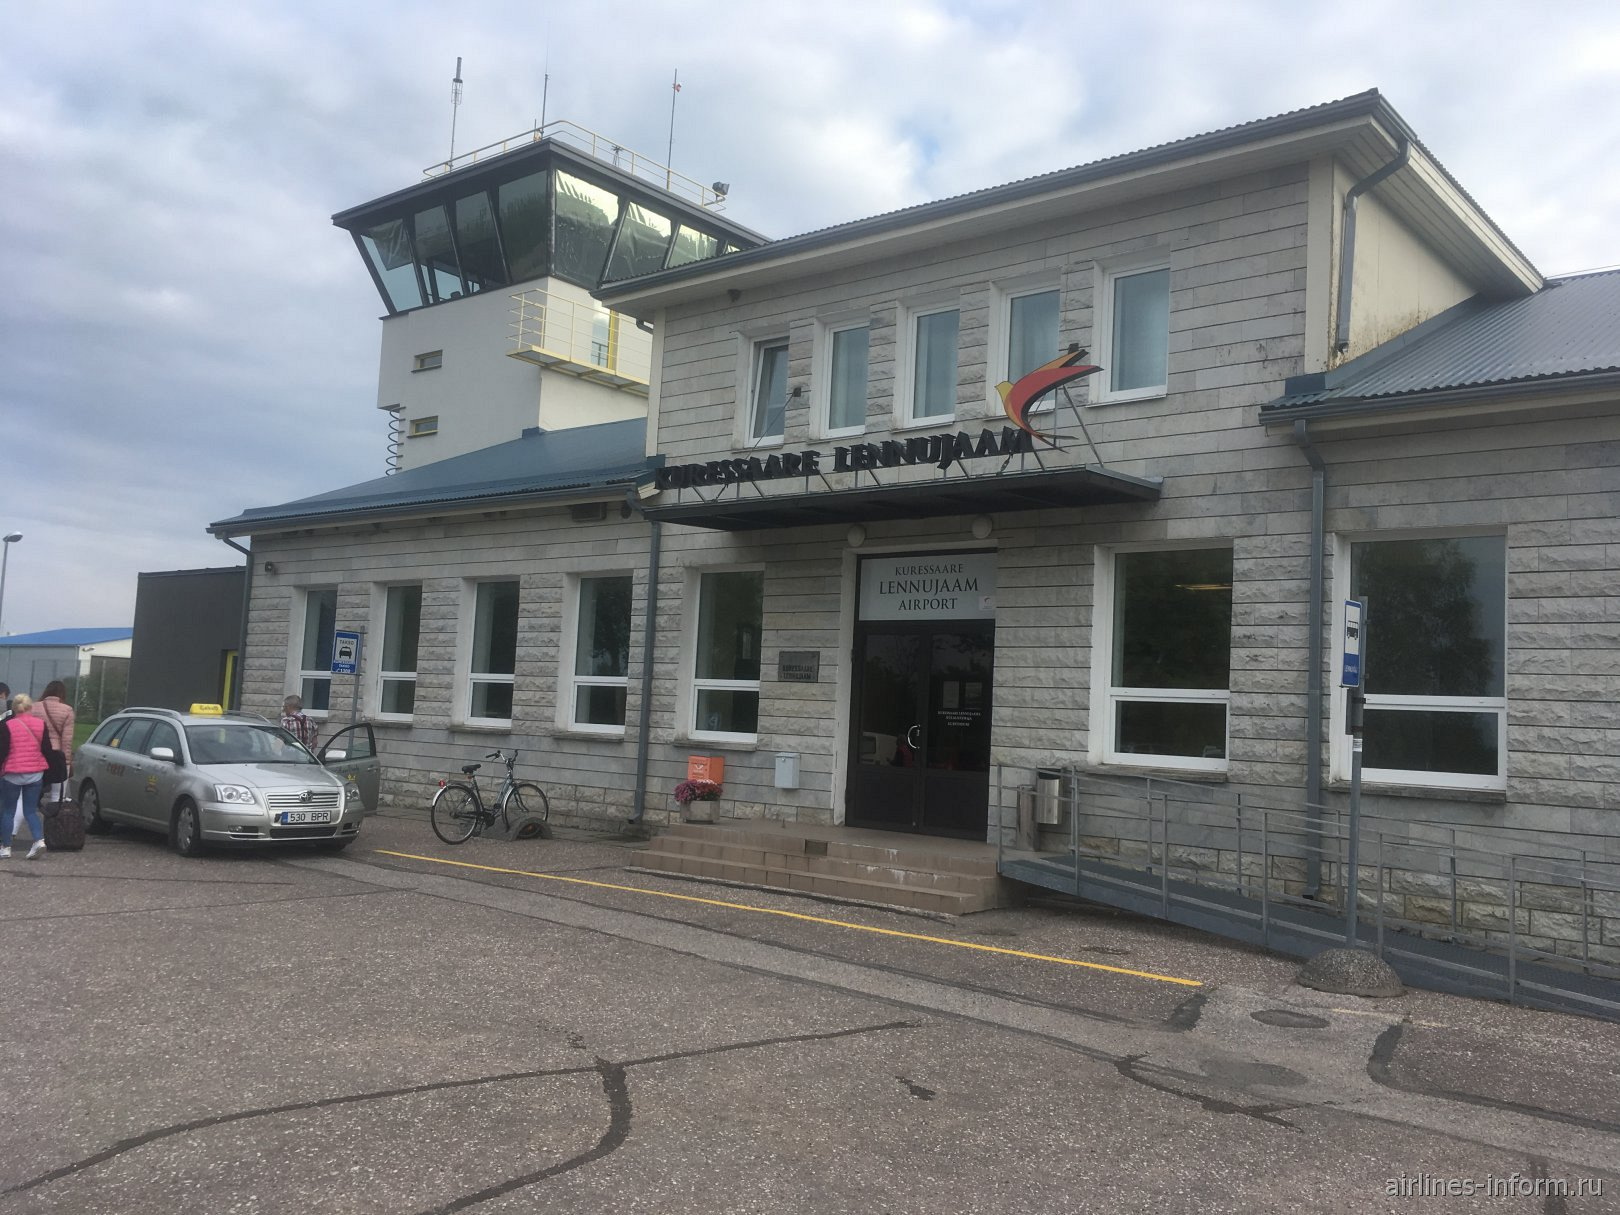 Аэровокзал аэропорта Курессааре